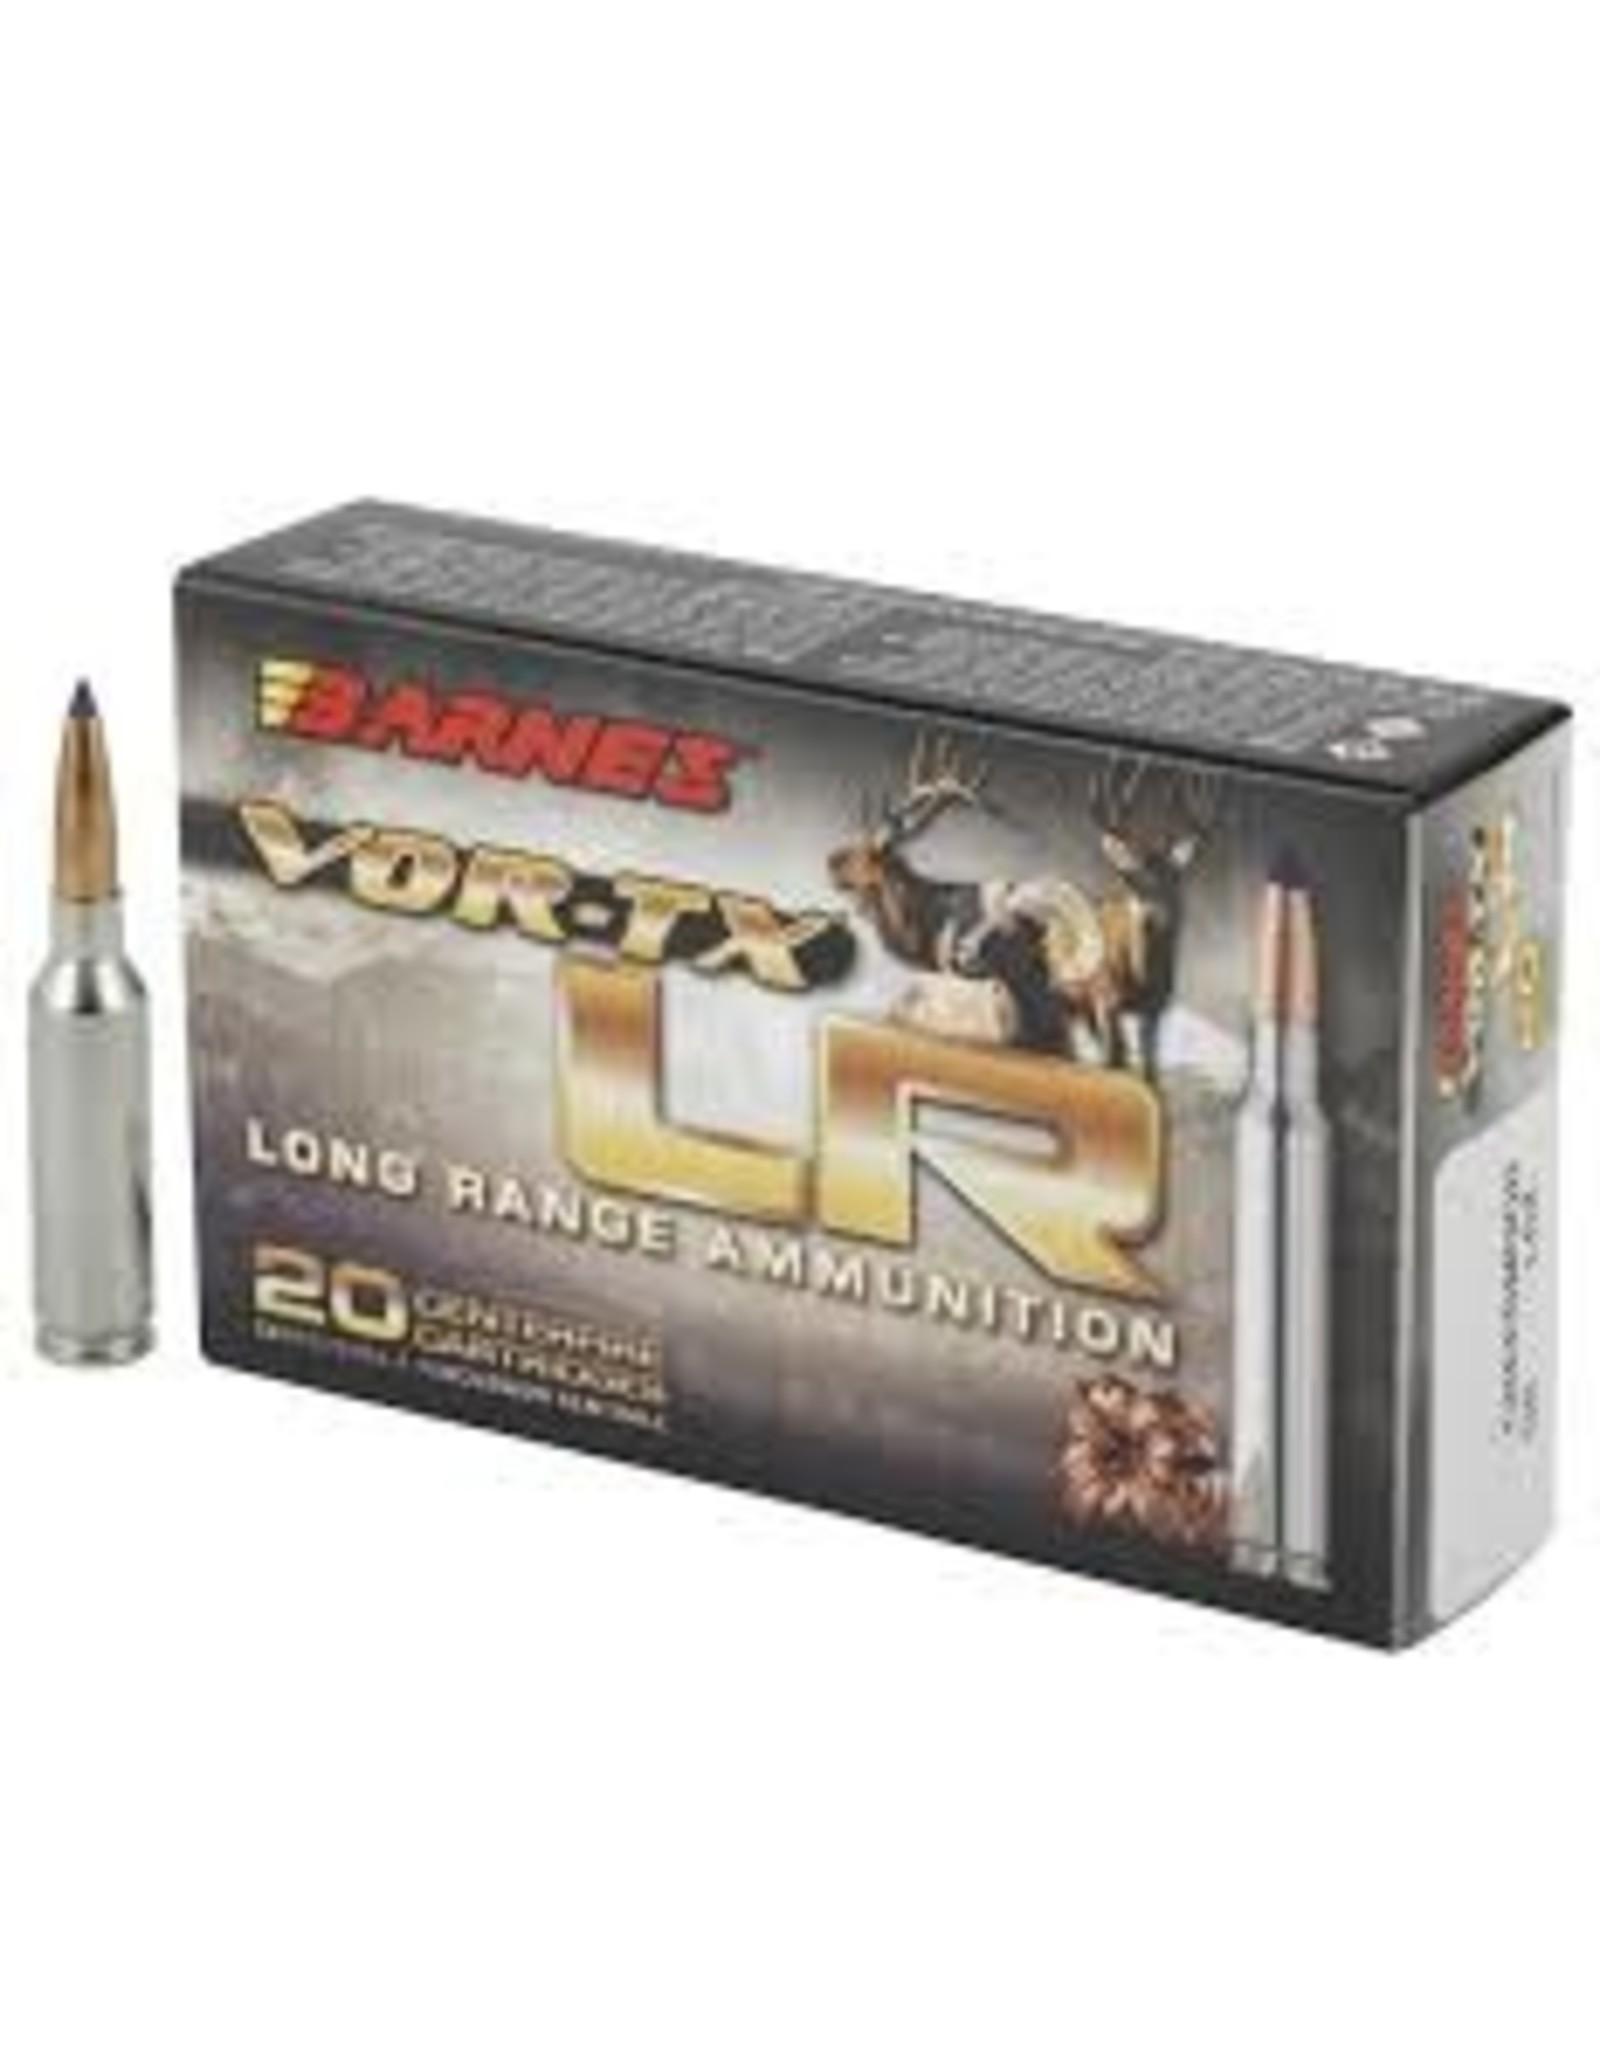 Barnes Barnes Vor-Tx Long Range Centerfire Rifle 6.5mm 127Gr 2825FPS LRX